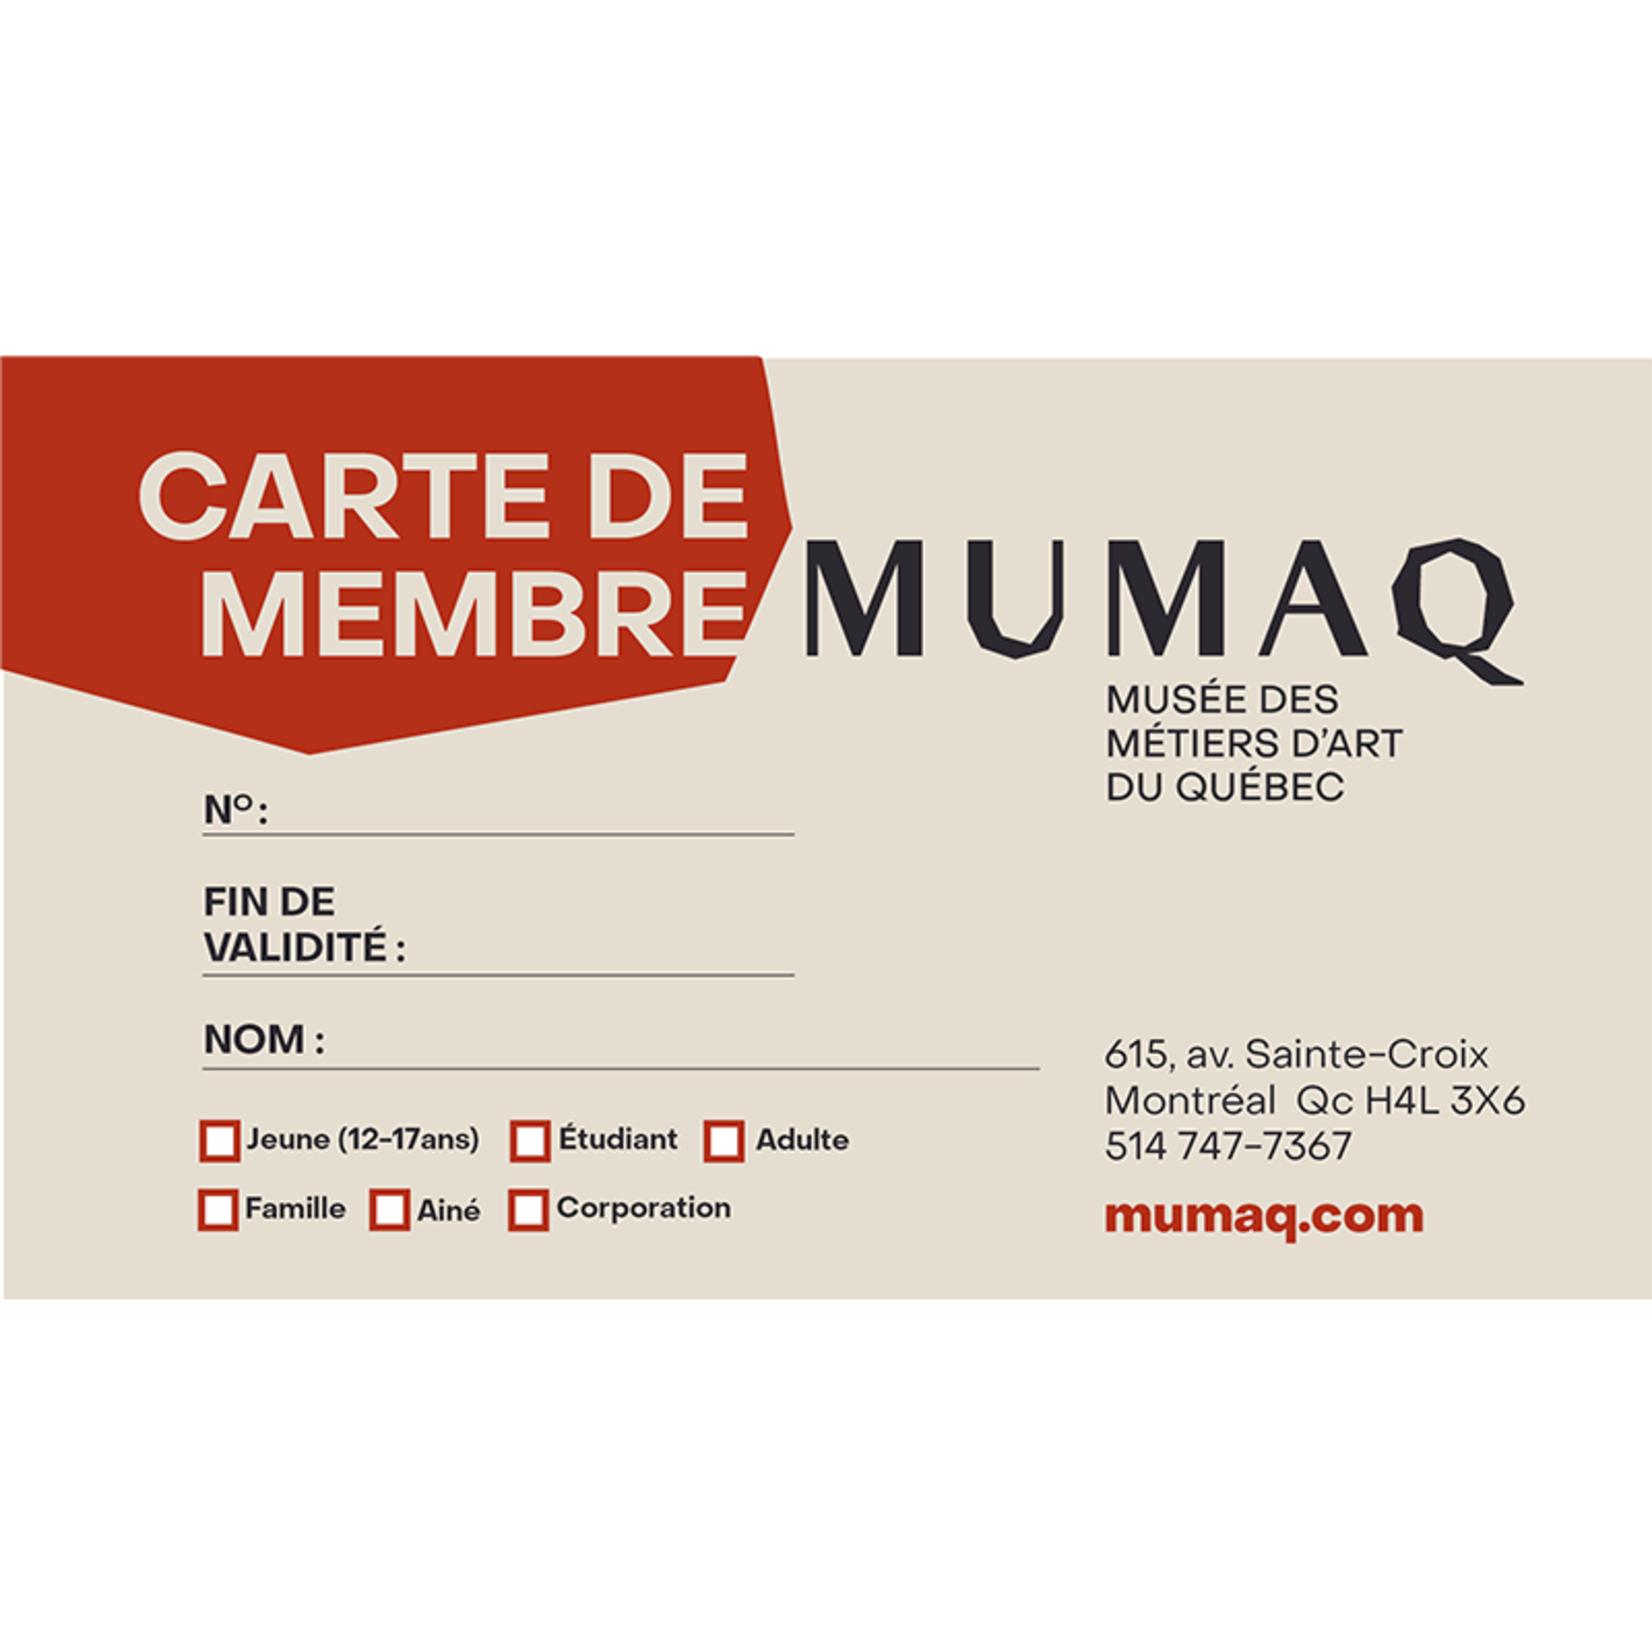 1 year membership card - Senior (65+)